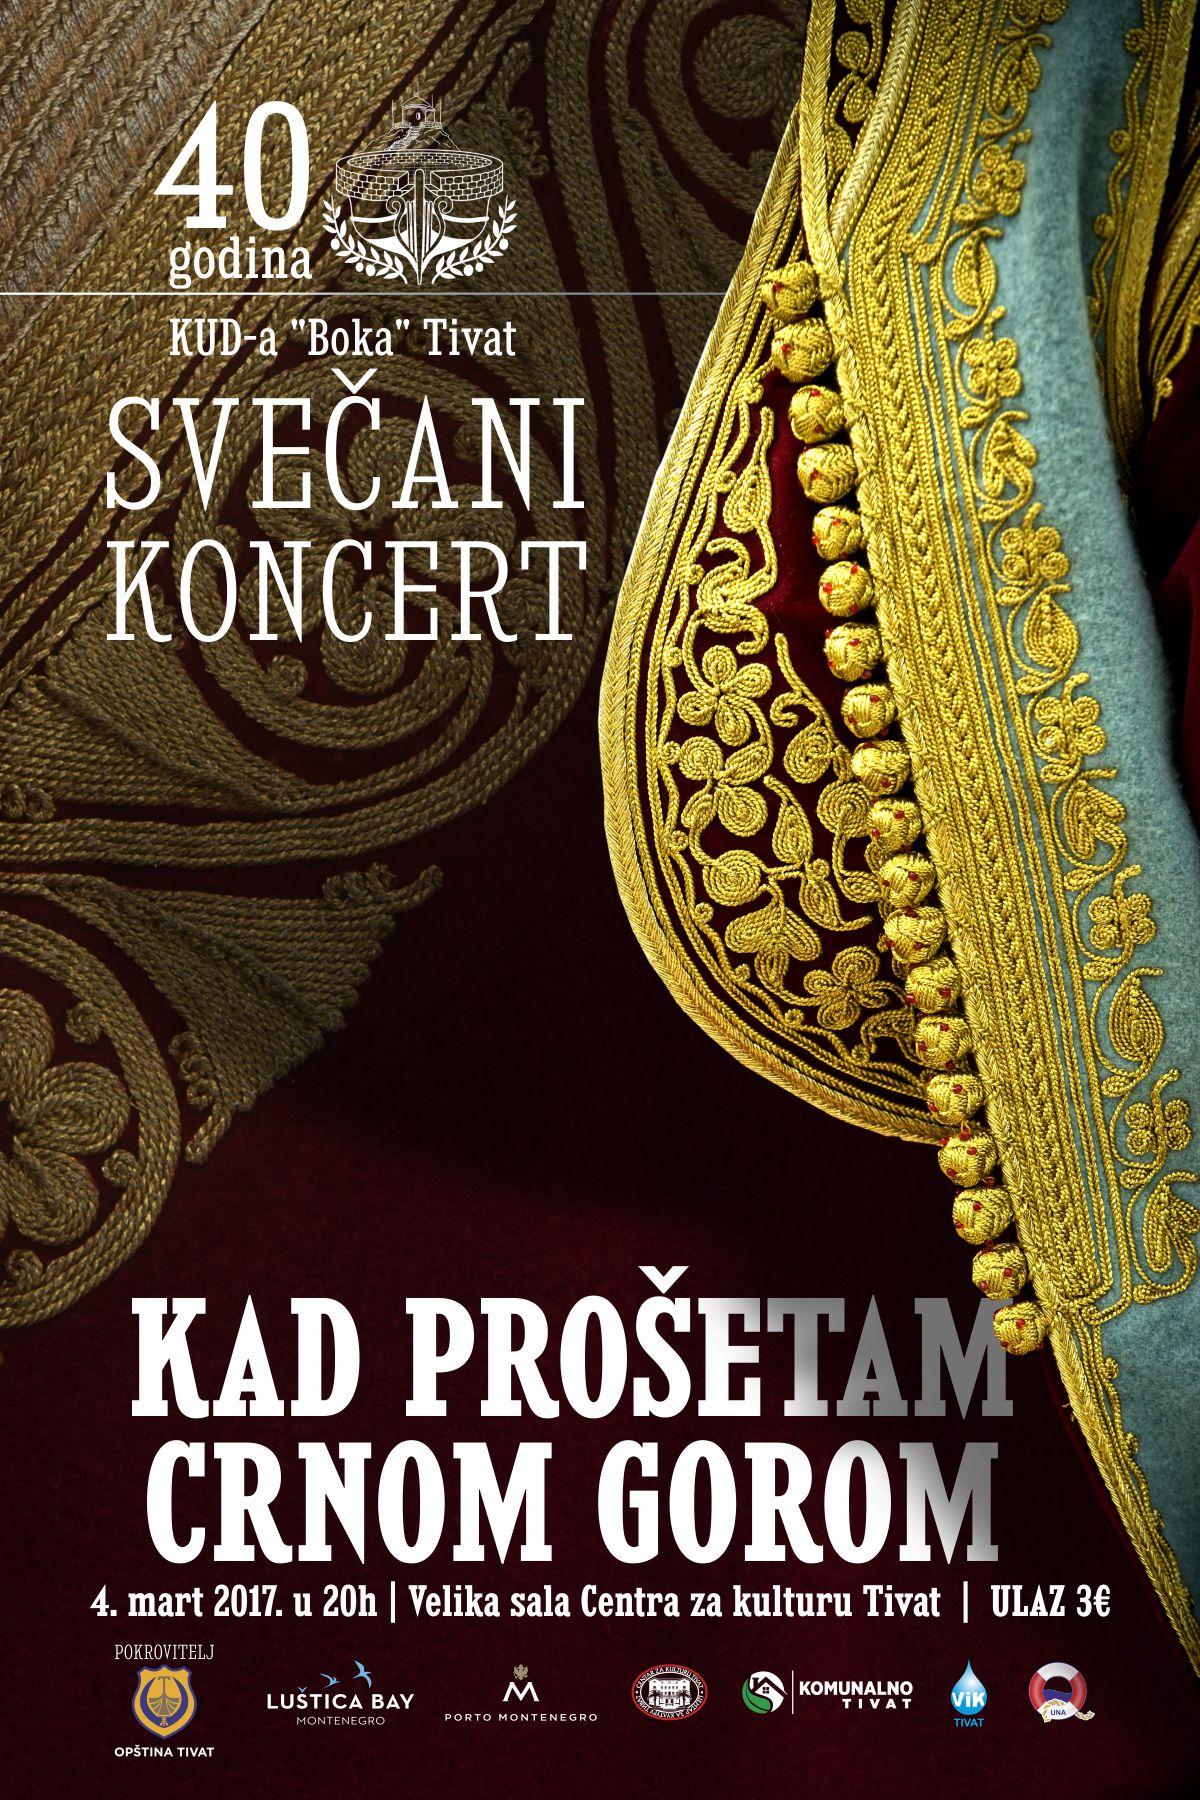 kud-boka-svecani-koncert